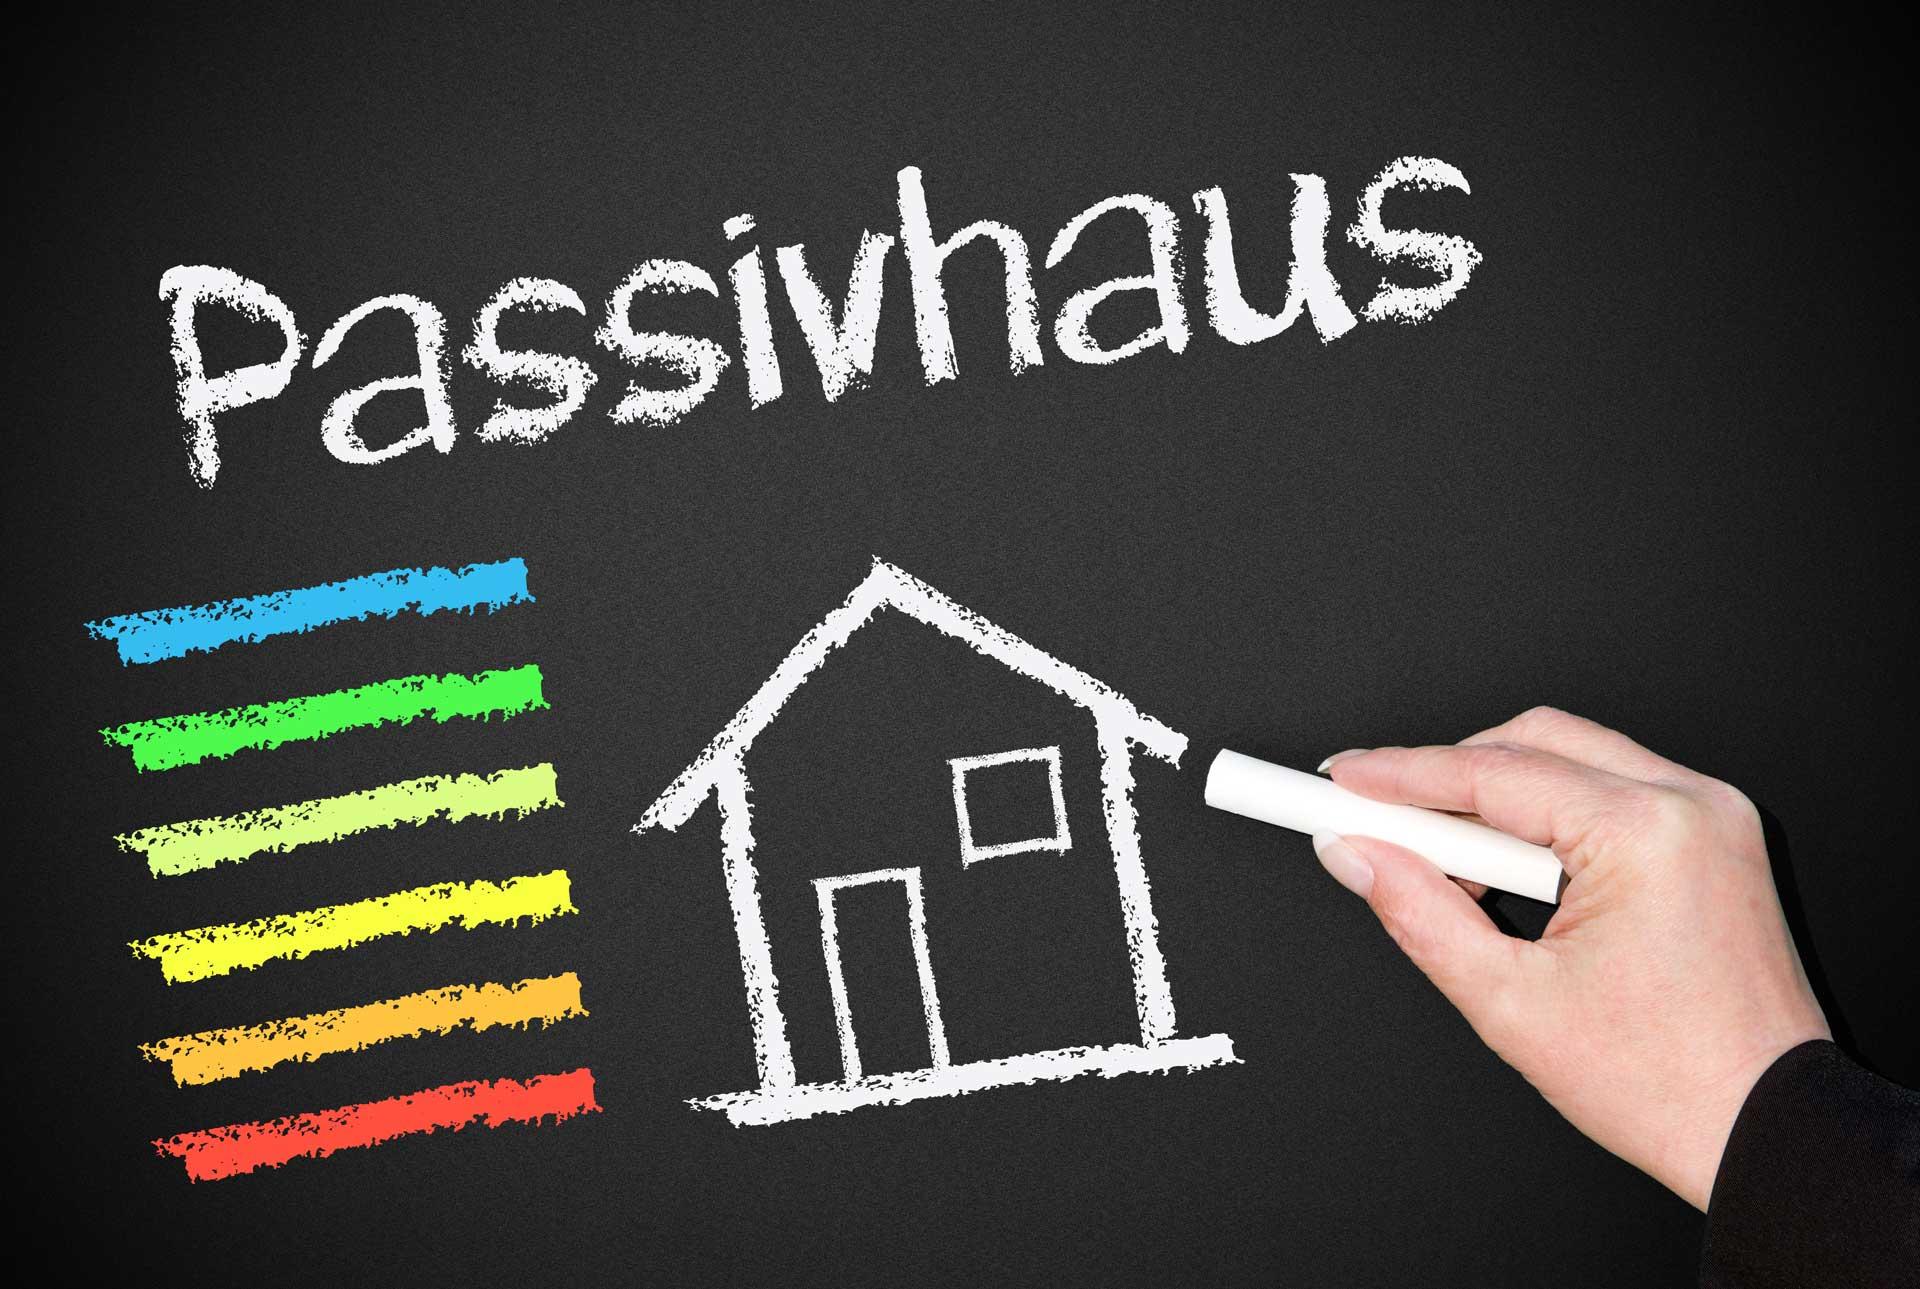 Maison Passivhaus